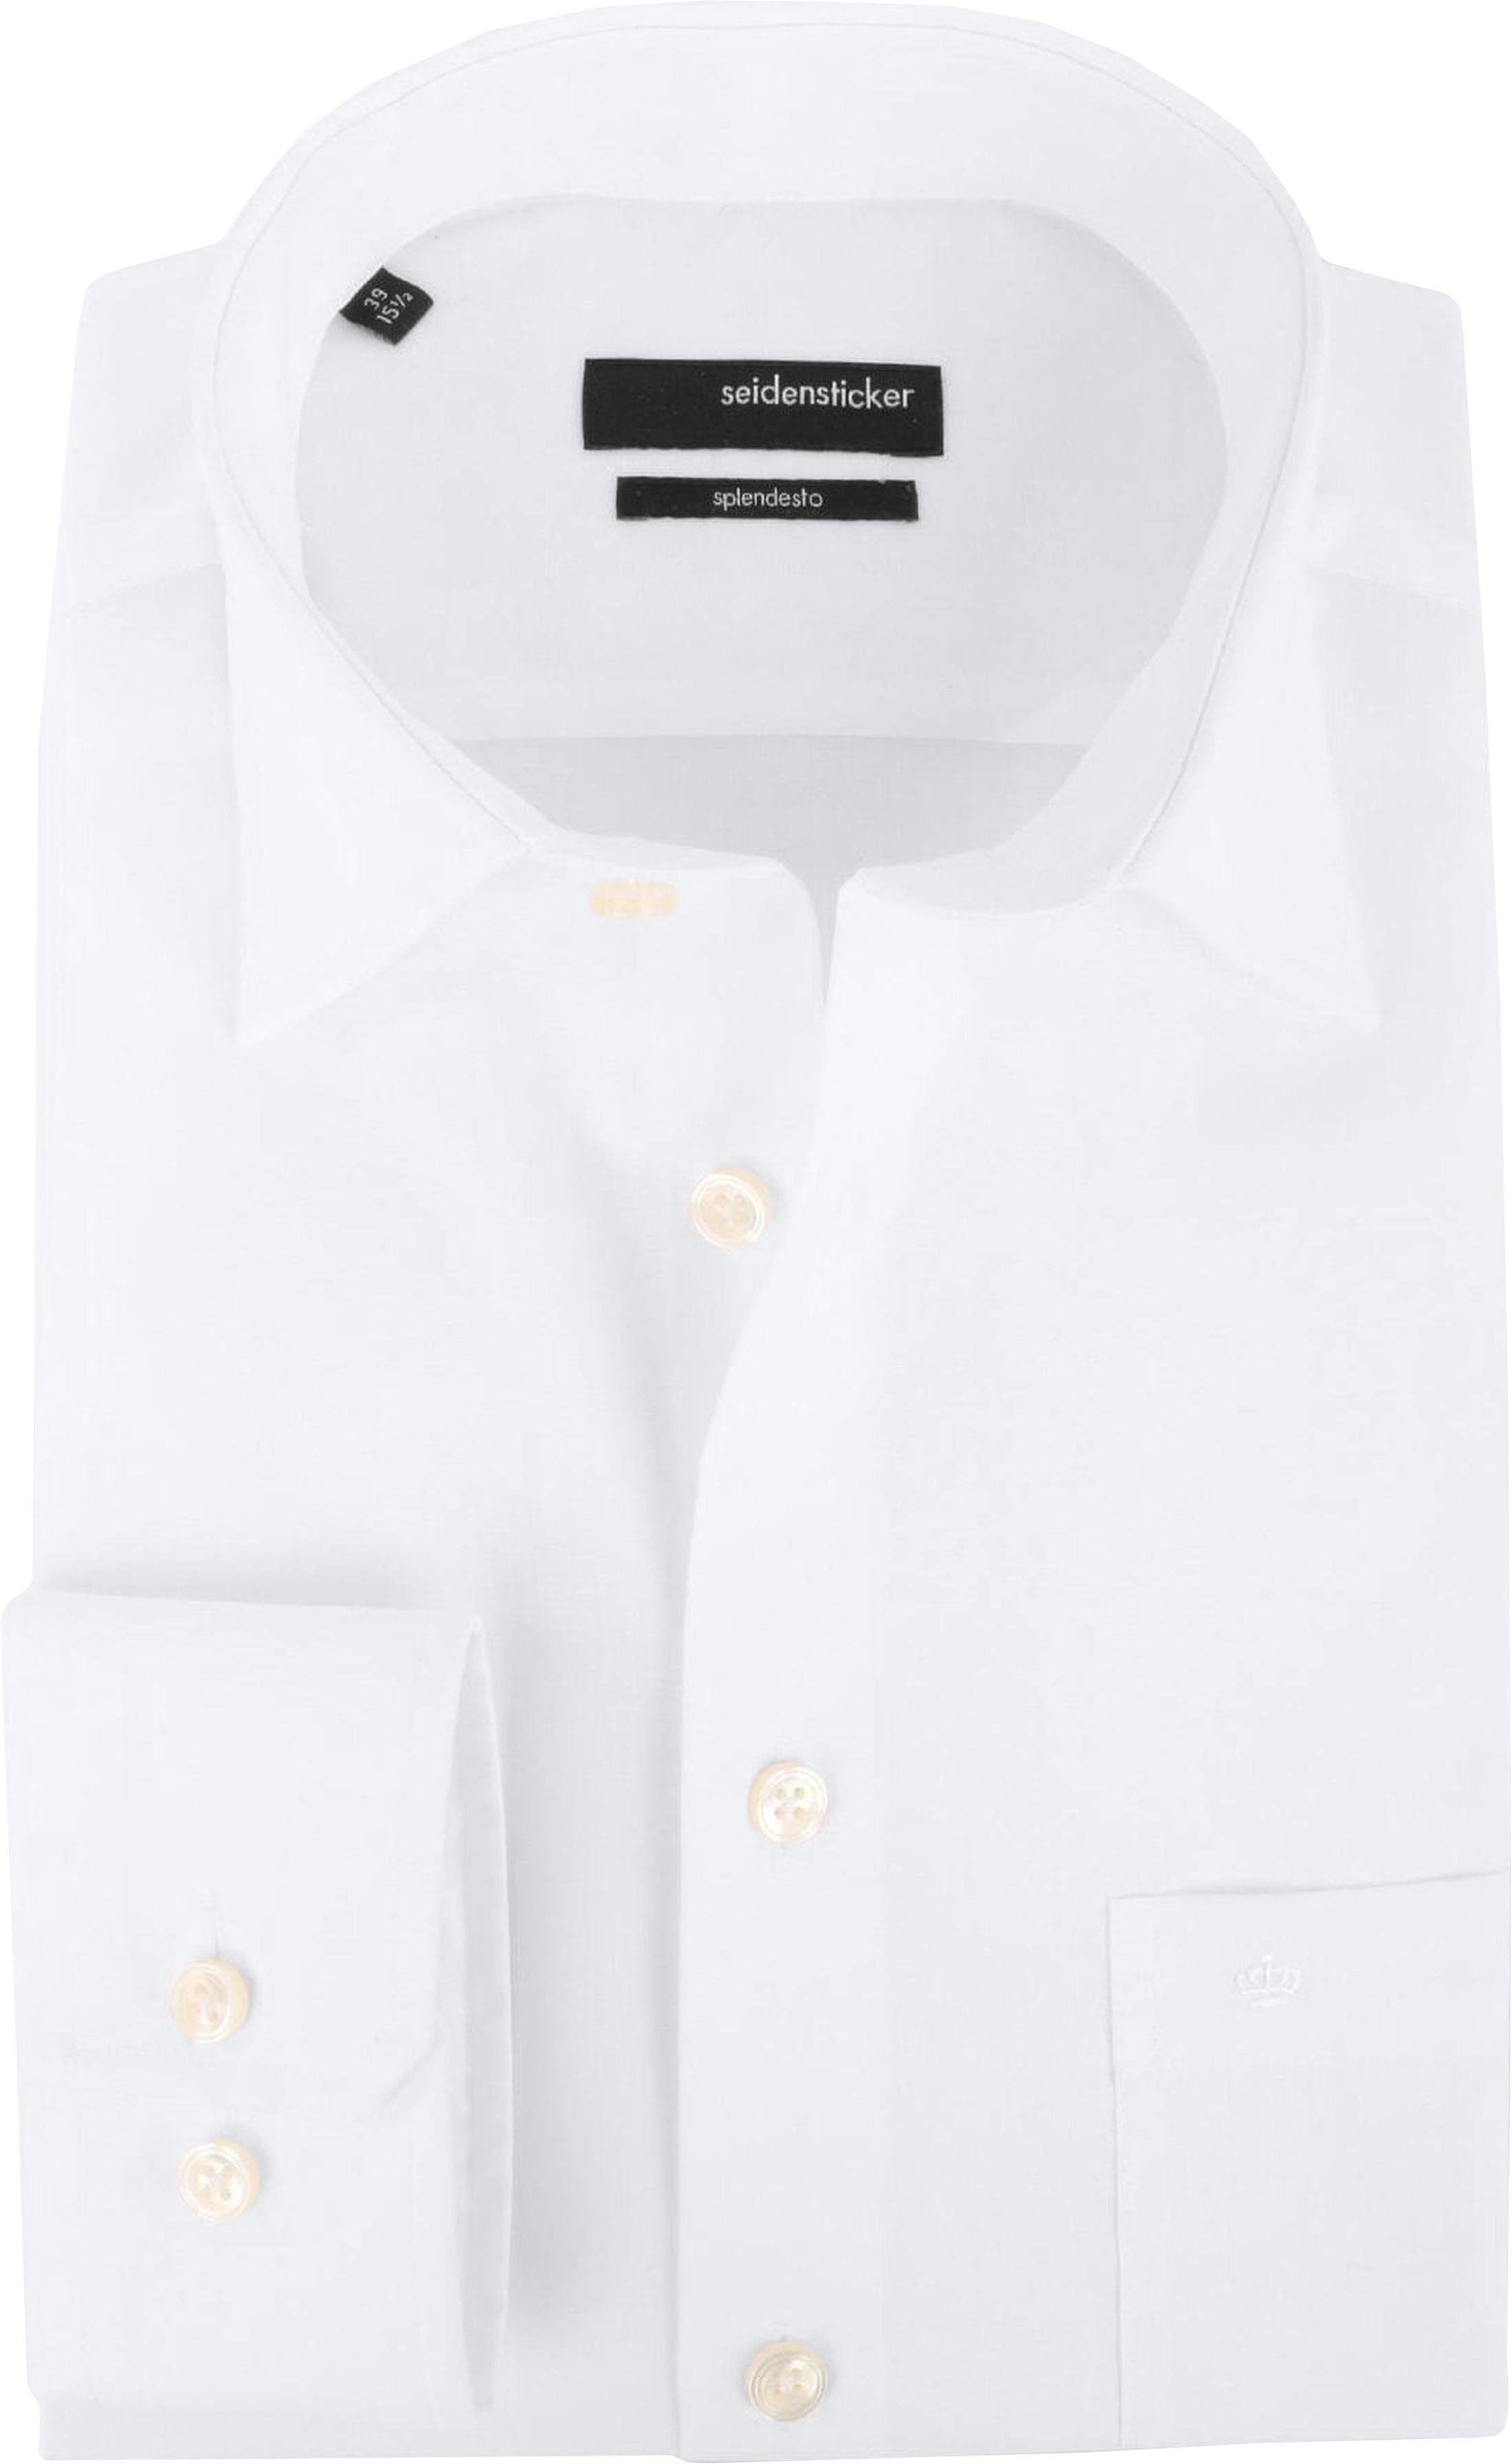 Seidensticker Splendesto Shirt White